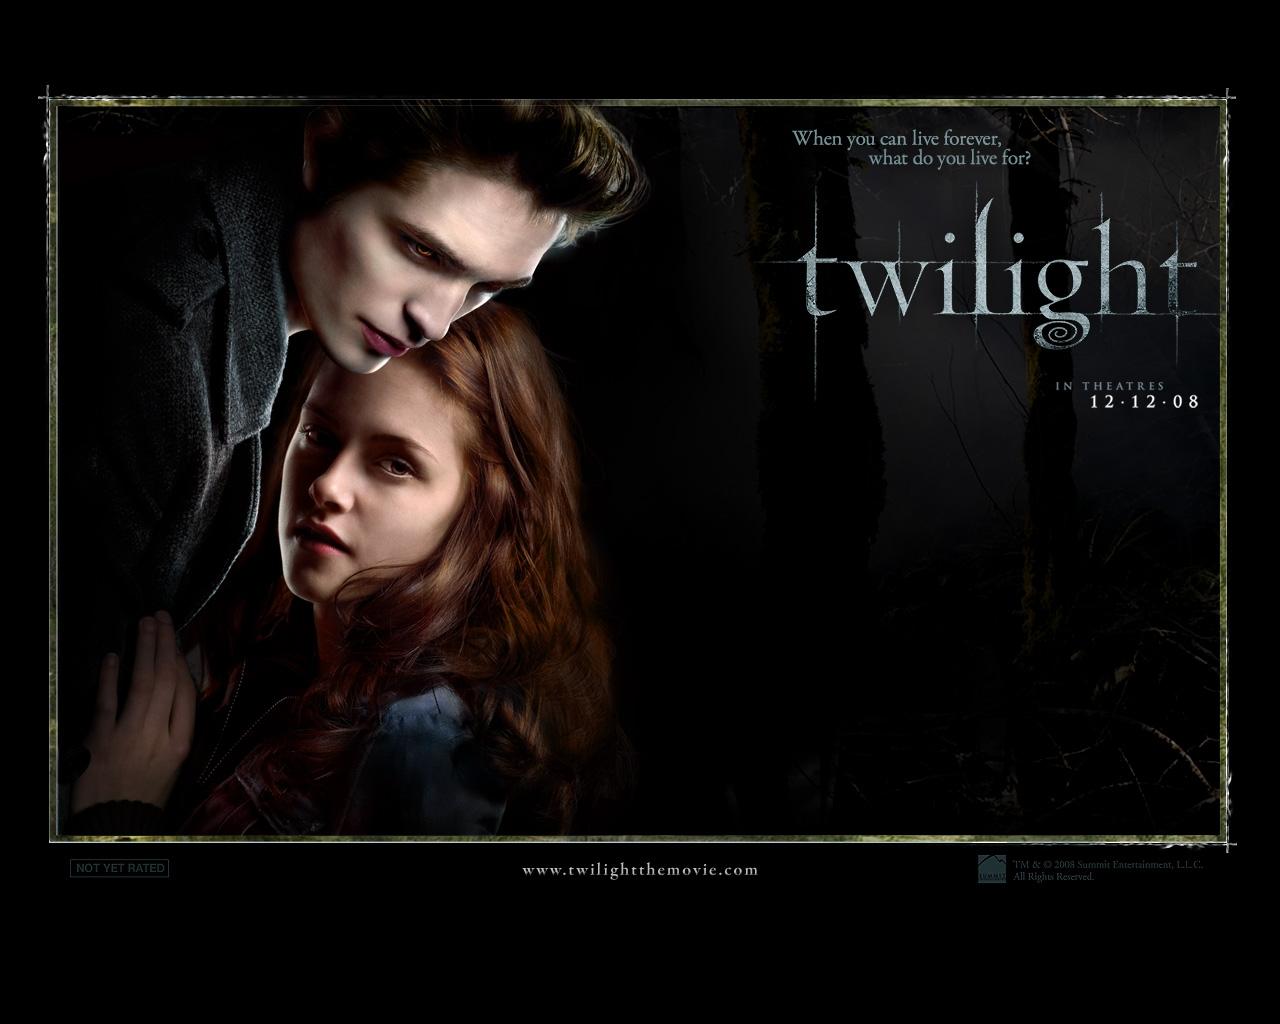 Wallpaper di Twilight